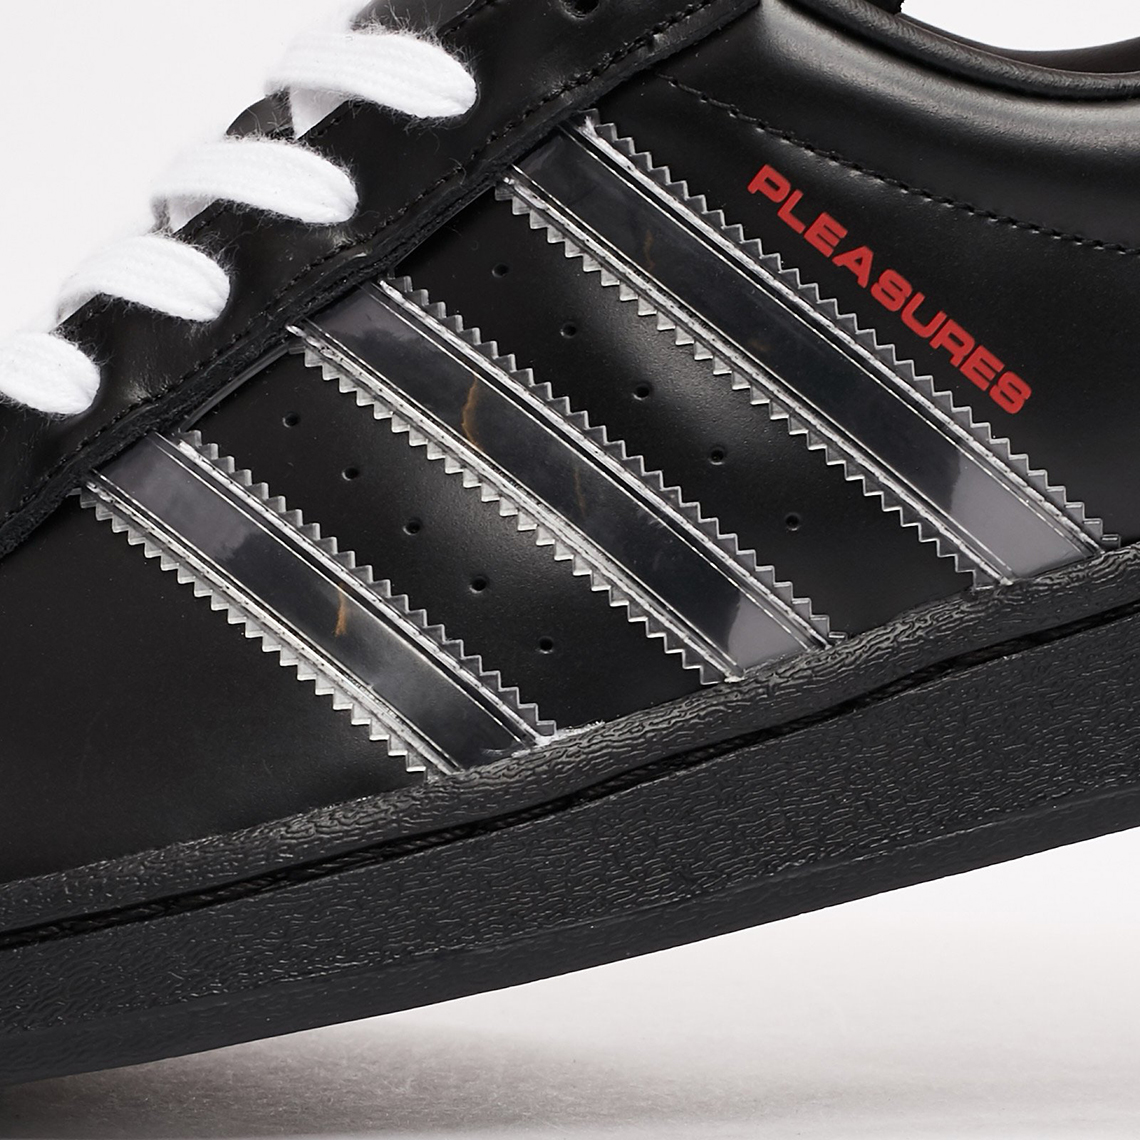 PLEASURES-adidas-Superstar-GY5691-5.jpg?w=1140